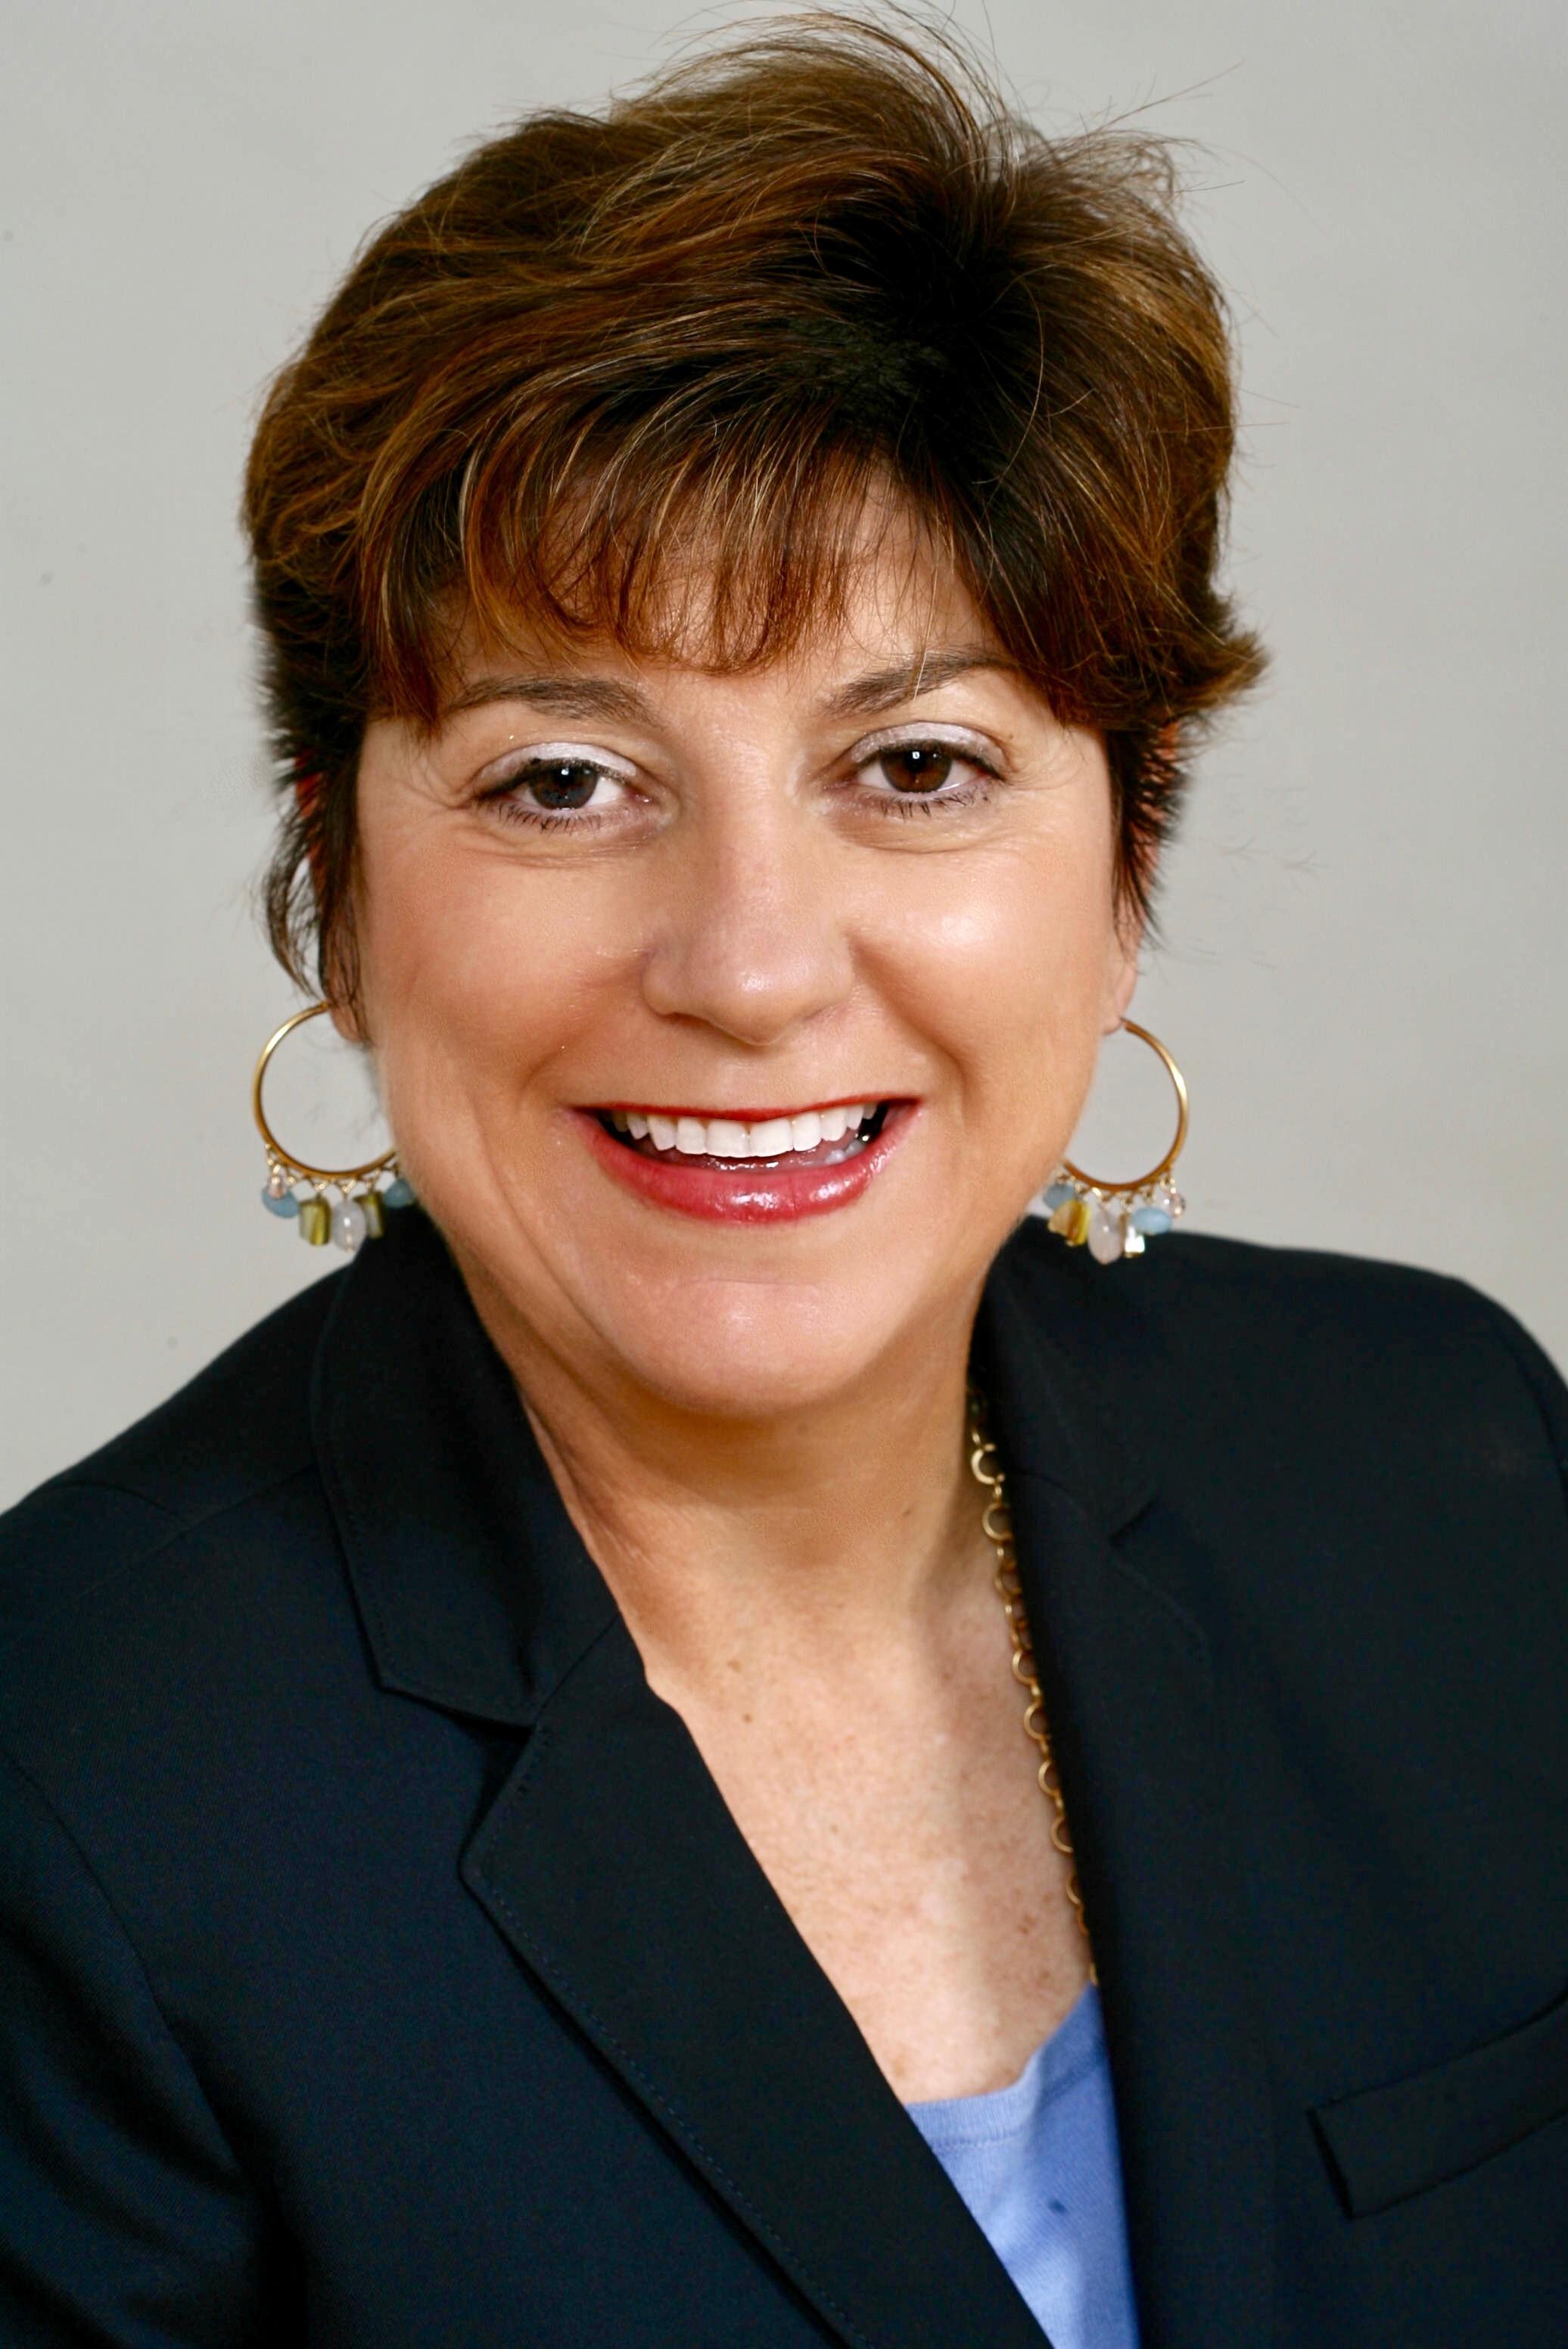 JOAN MARIE BONVICINI  Your Registered Representative & Insurance Agent